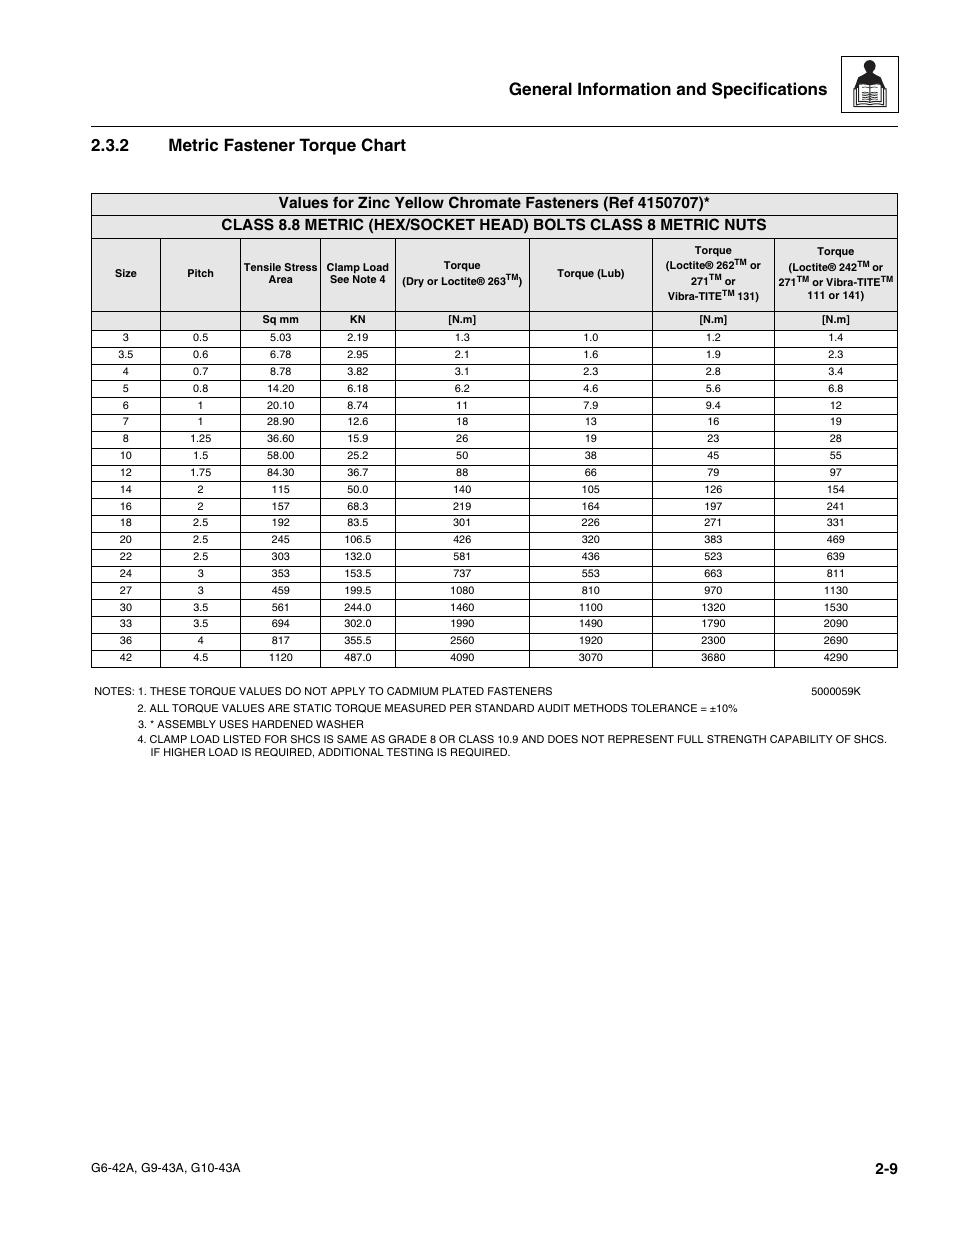 2 metric fastener torque chart, Metric fastener torque